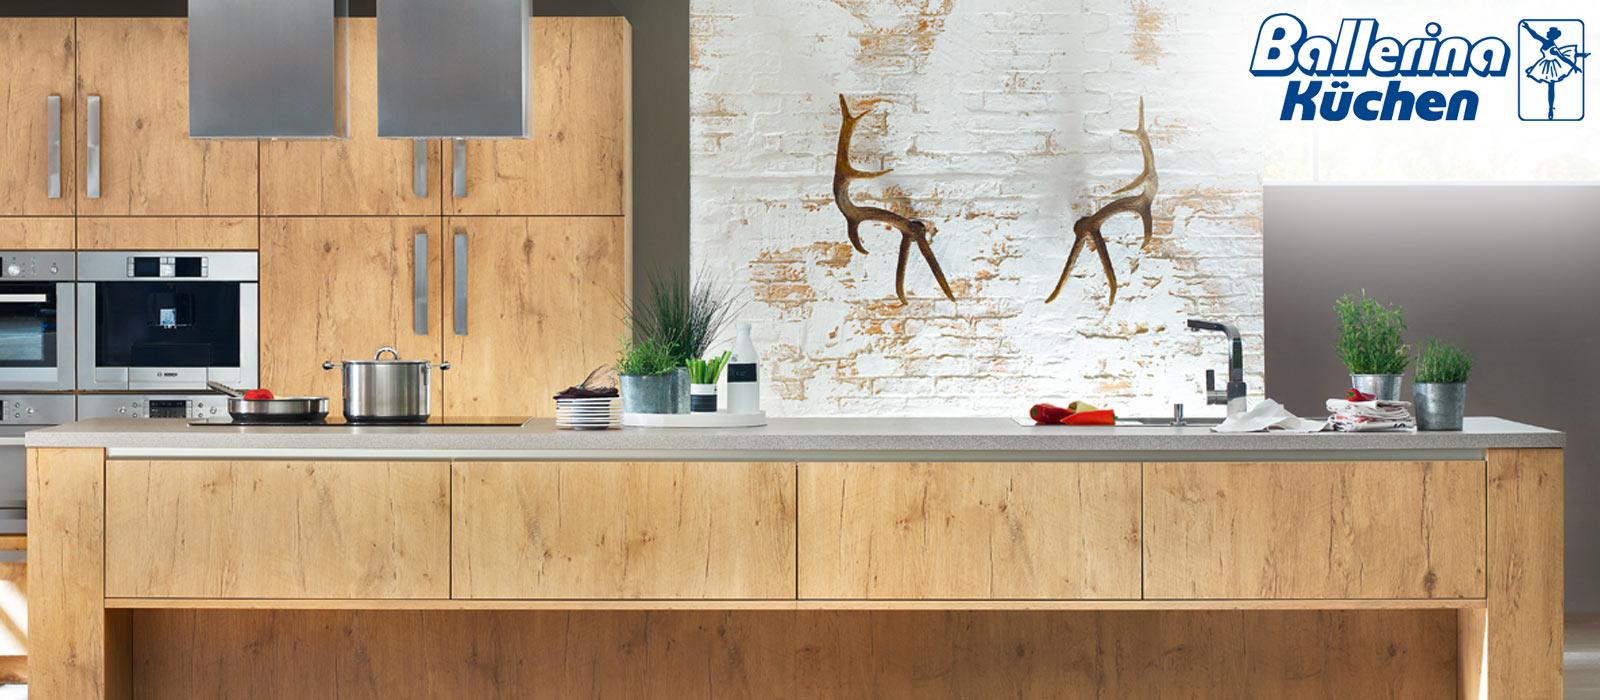 stunning ballerina k chen preise images house design ideas. Black Bedroom Furniture Sets. Home Design Ideas